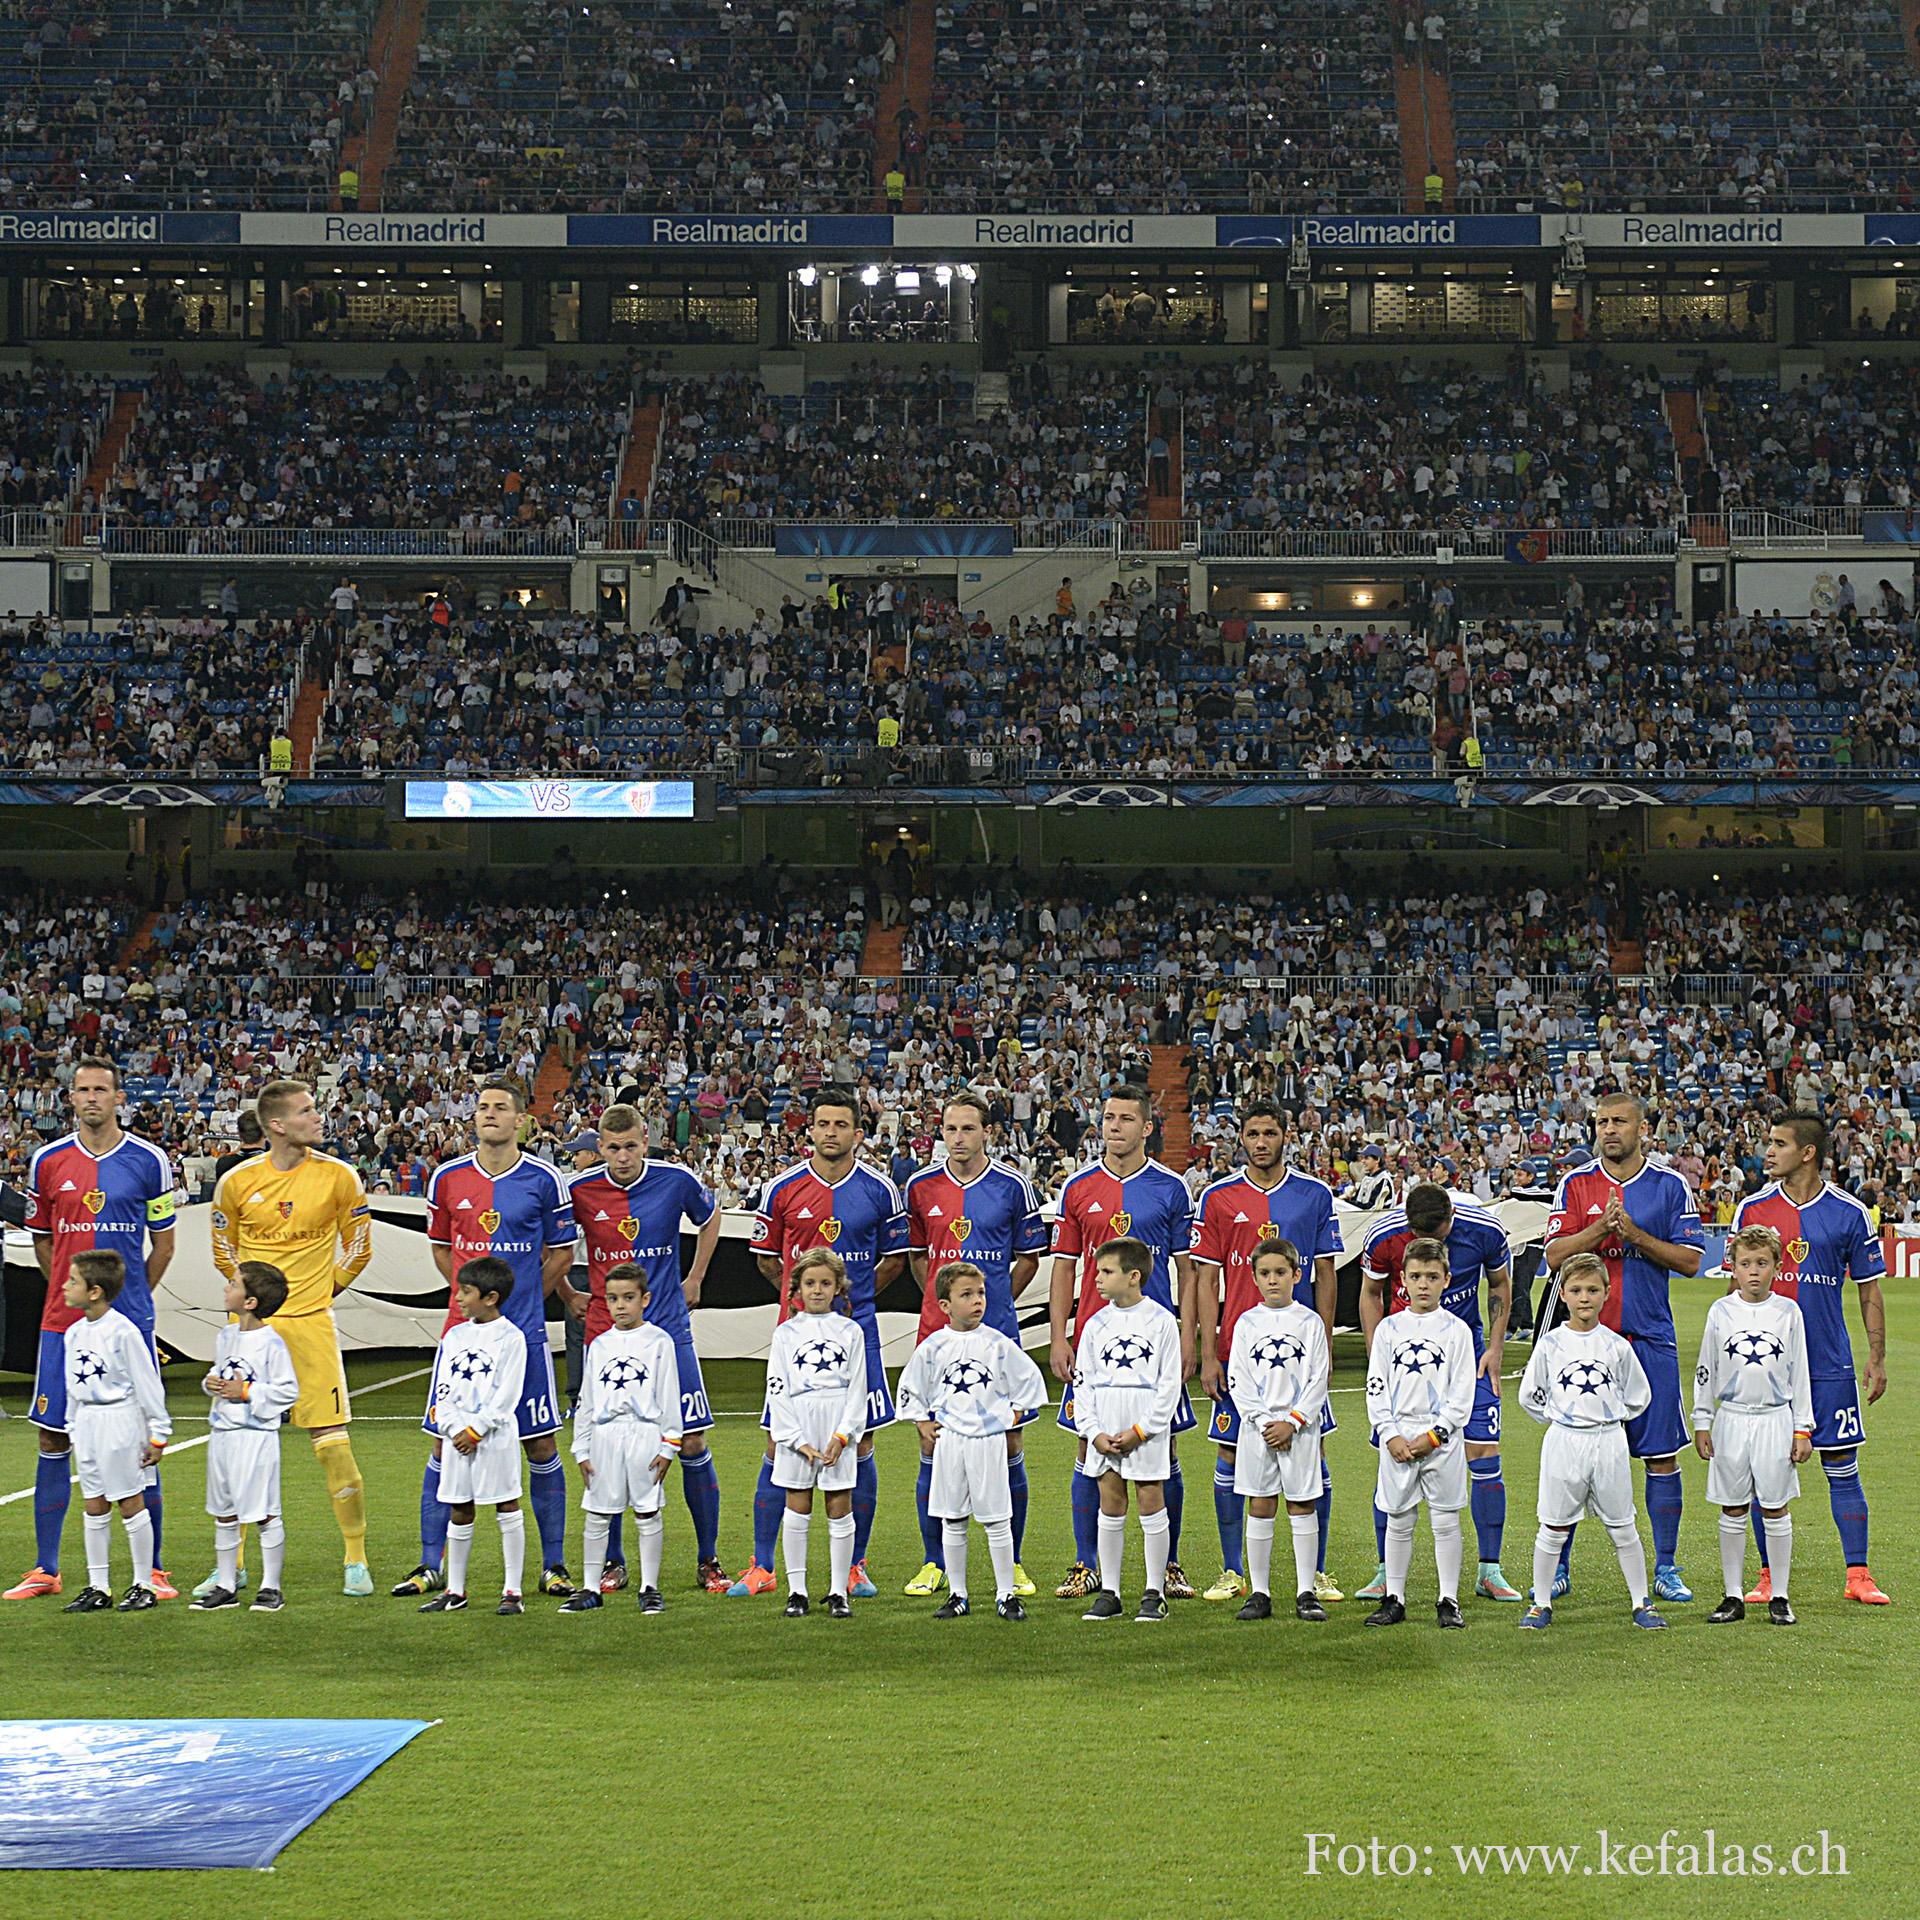 FF_CL_Real Madrid-FCB_16.9.14_2.jpg